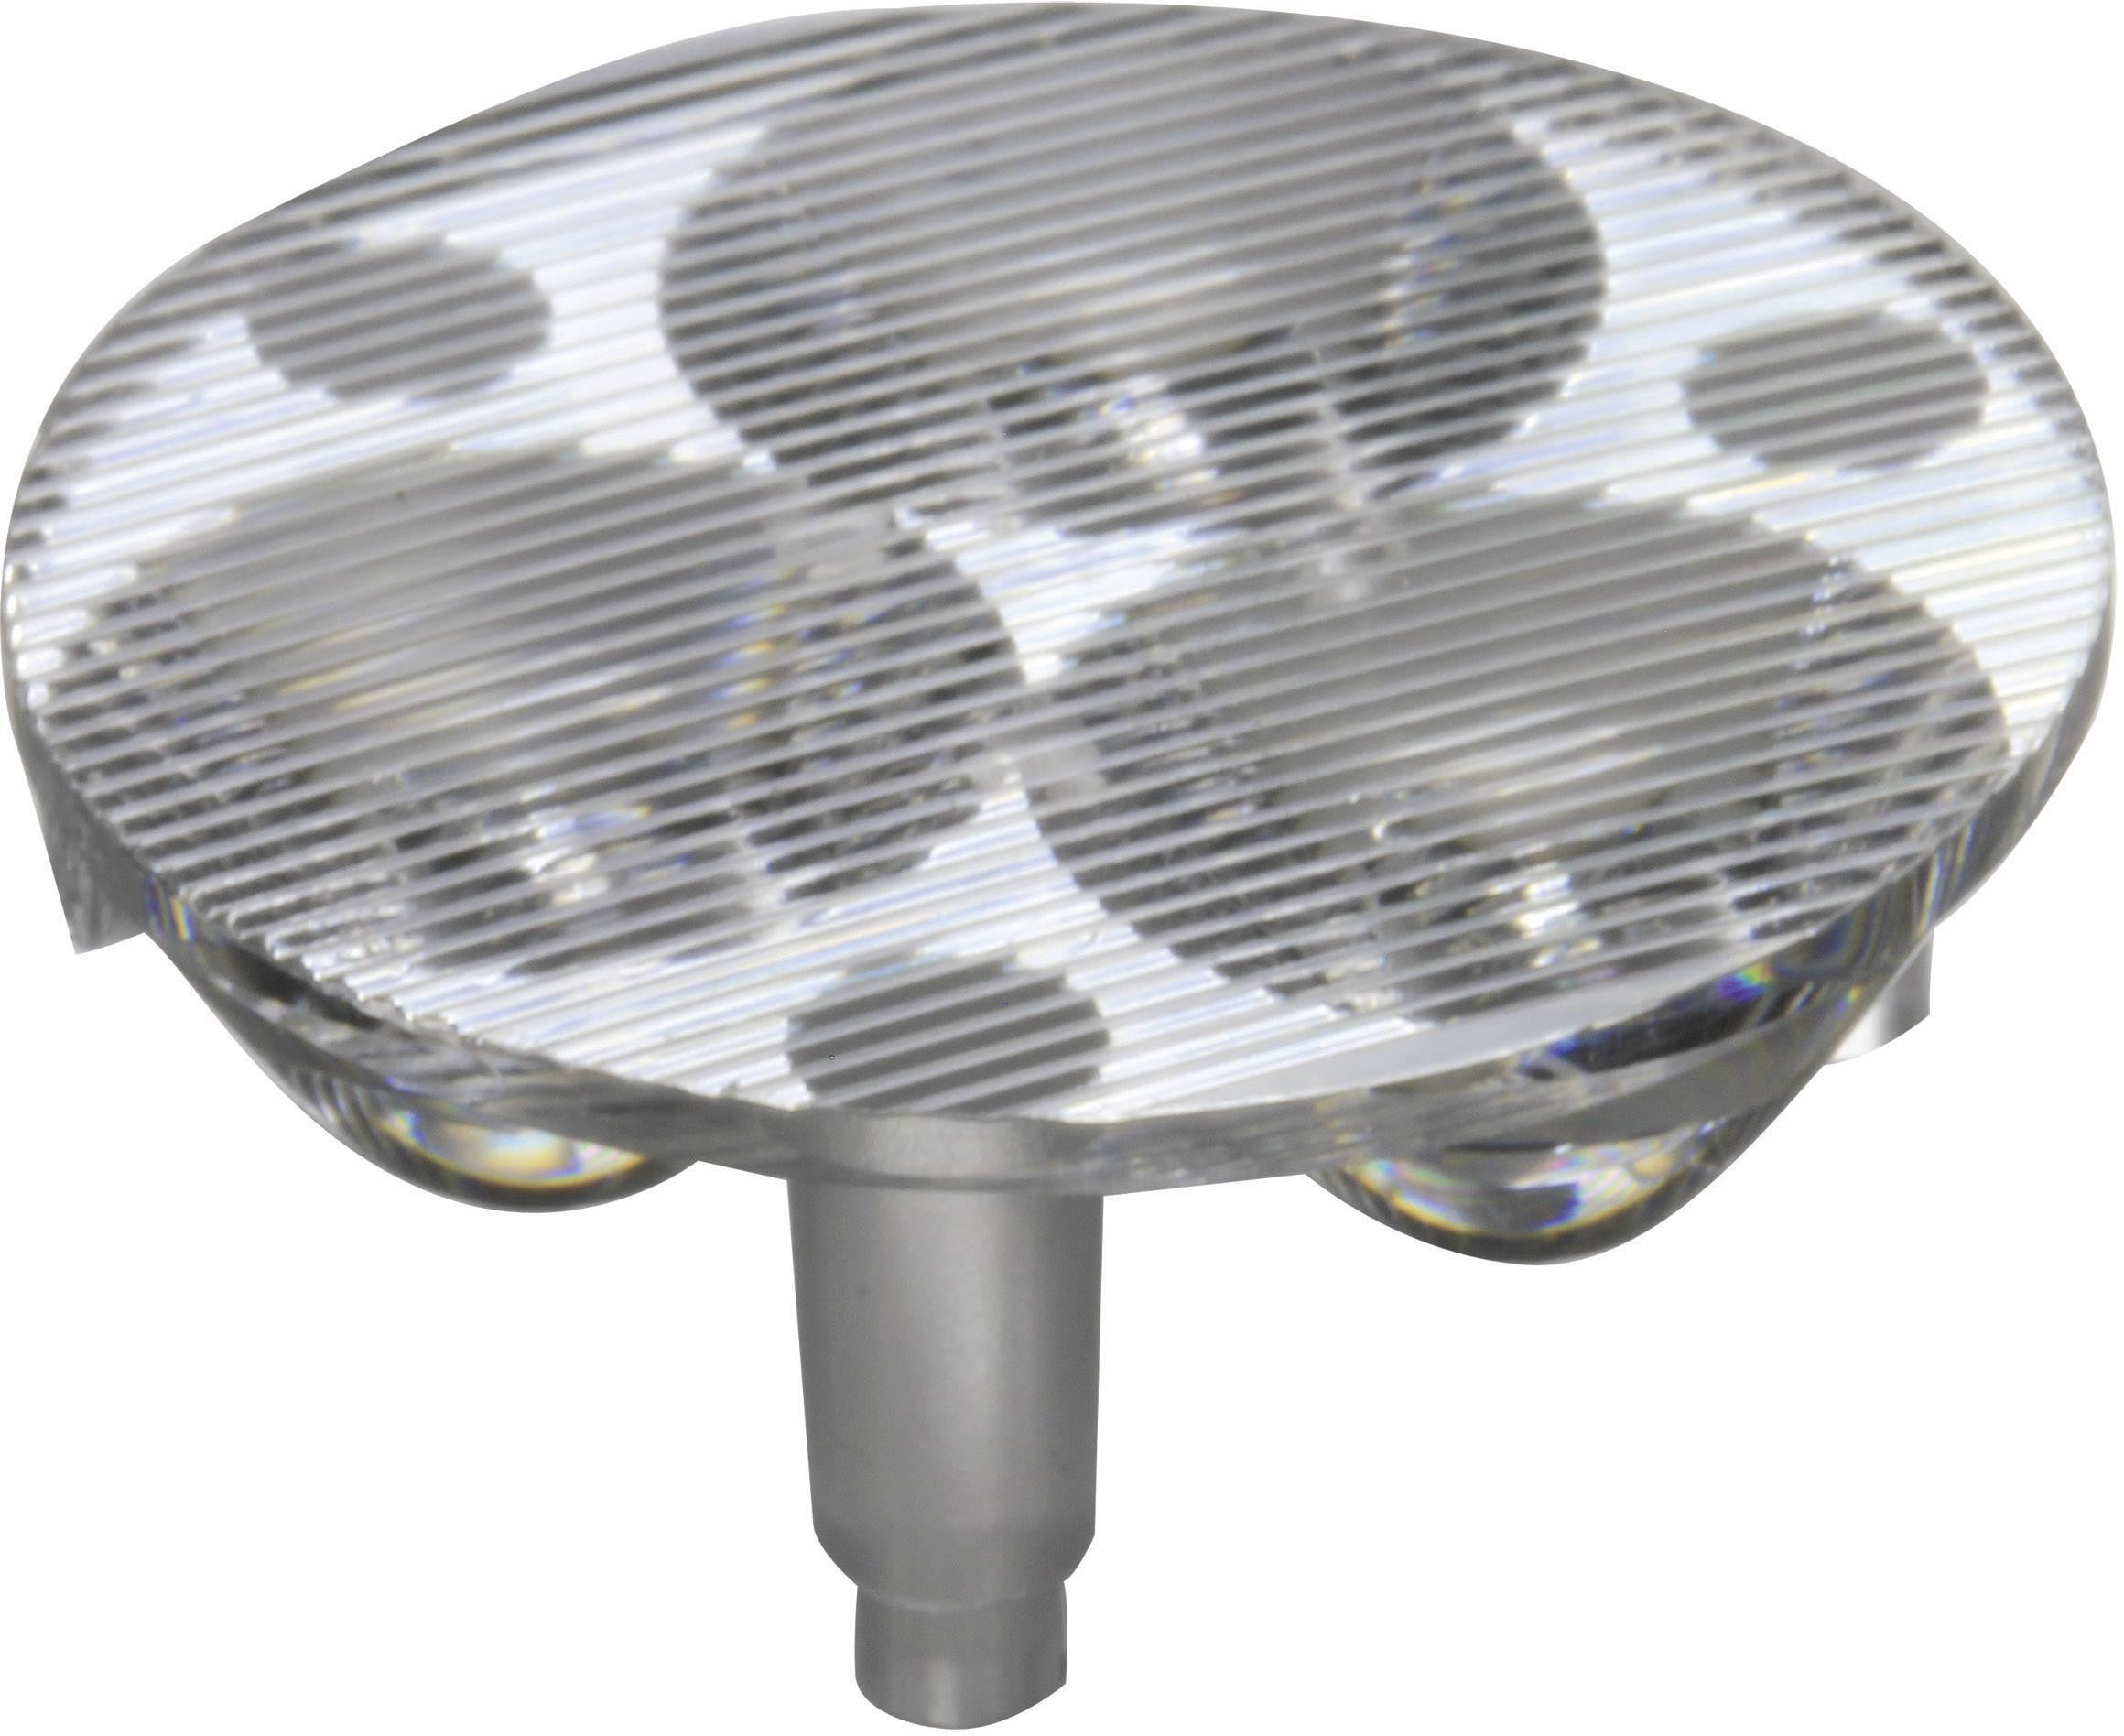 Optika pro Luxeon ® Rebel nebo Seoul Semiconductor ® Z5 Carclo 10510, 46.6x17°